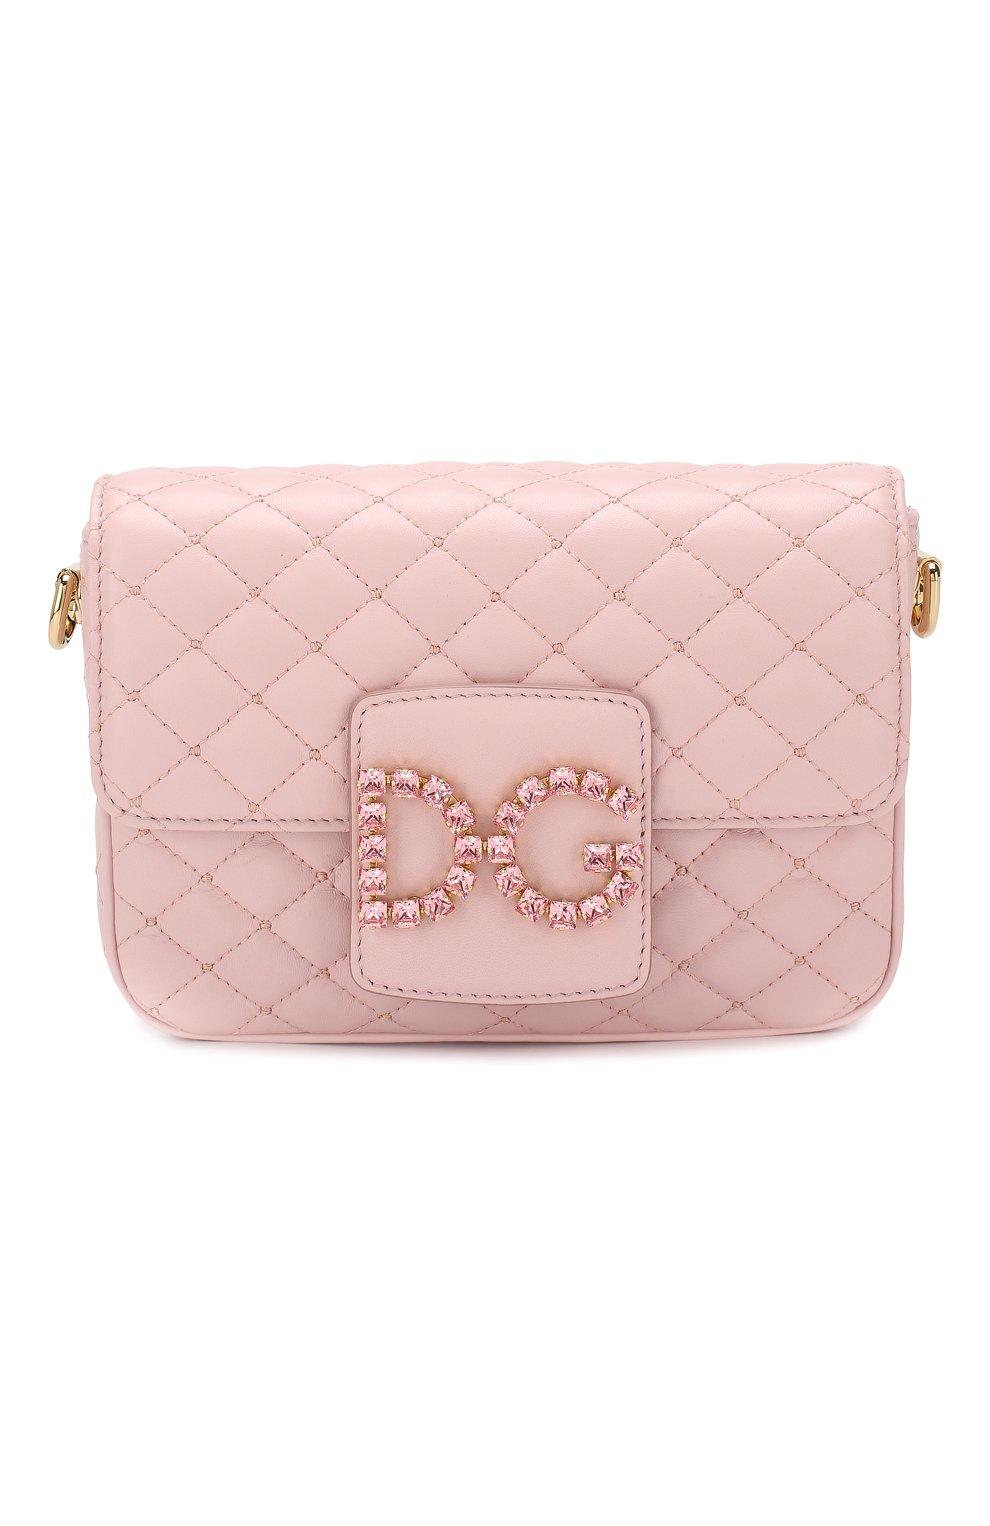 Сумка DG Millennials Dolce & Gabbana светло-розовая цвета   Фото №1